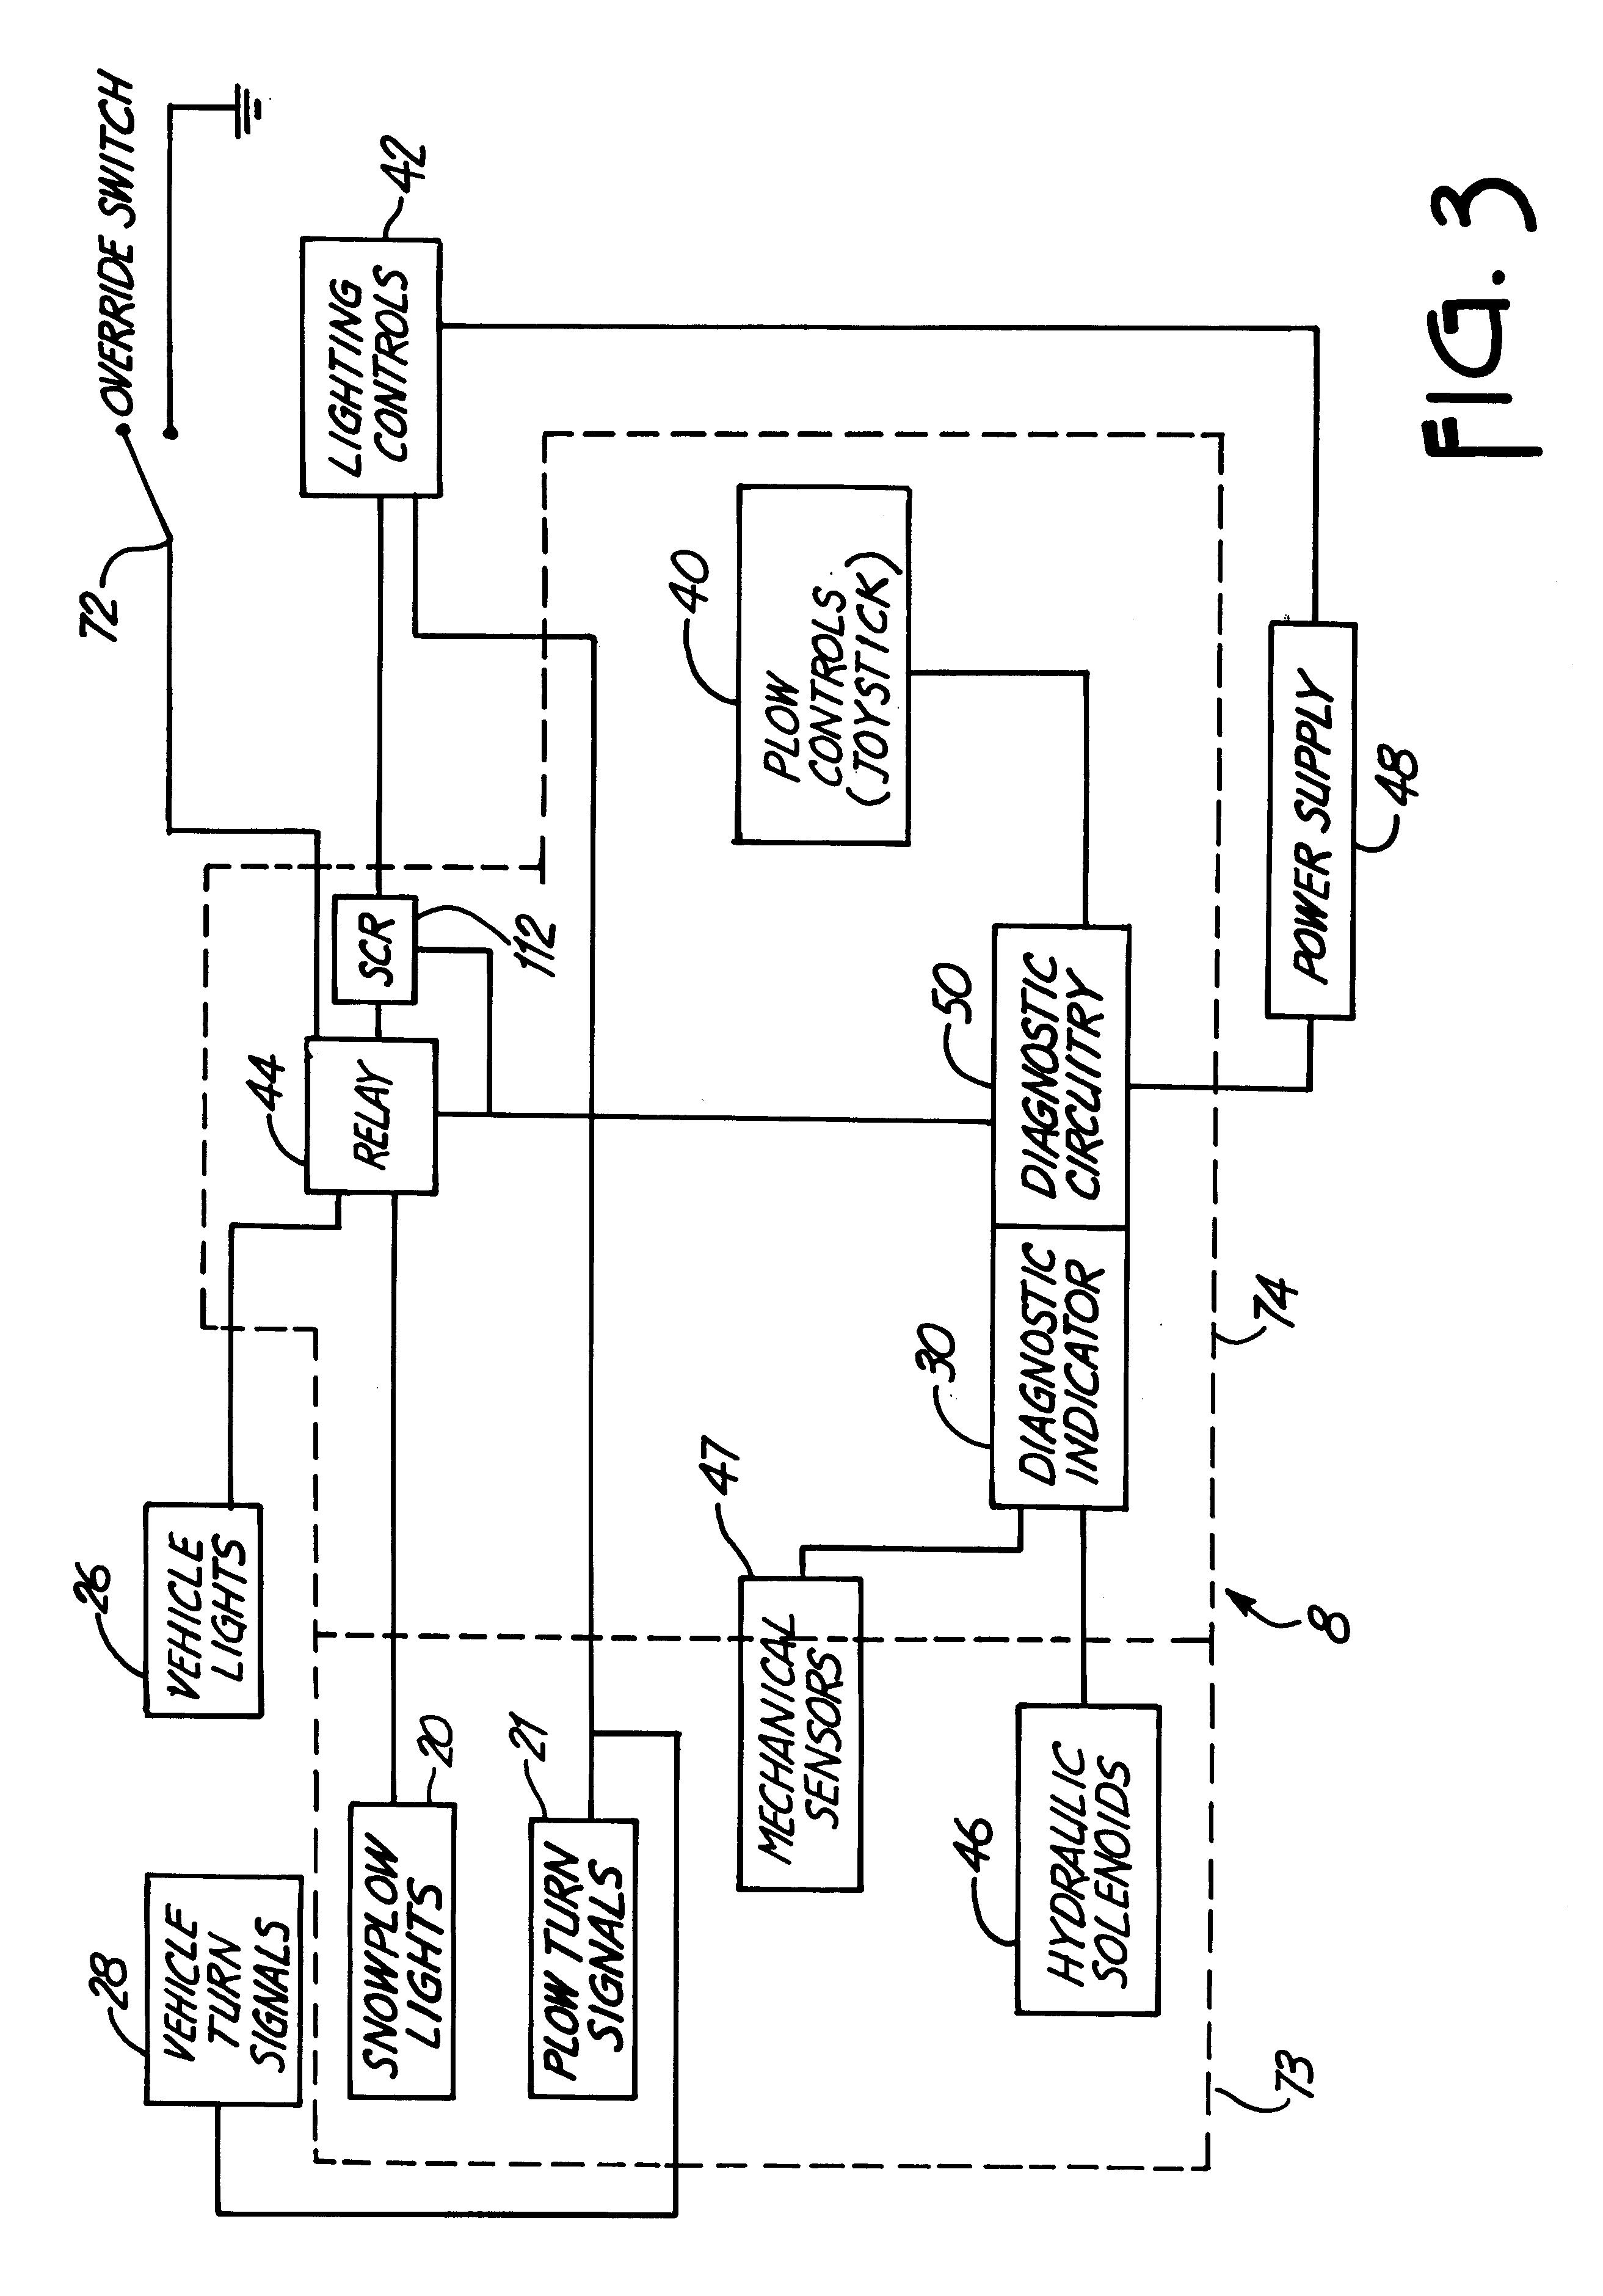 sno way wiring diagram nova wiring diagram jpeg patent us6323759 snowplow diagnostic system google patents us06323759 20011127 d00003 us6323759 sno way wiring diagram sno way wiring diagram